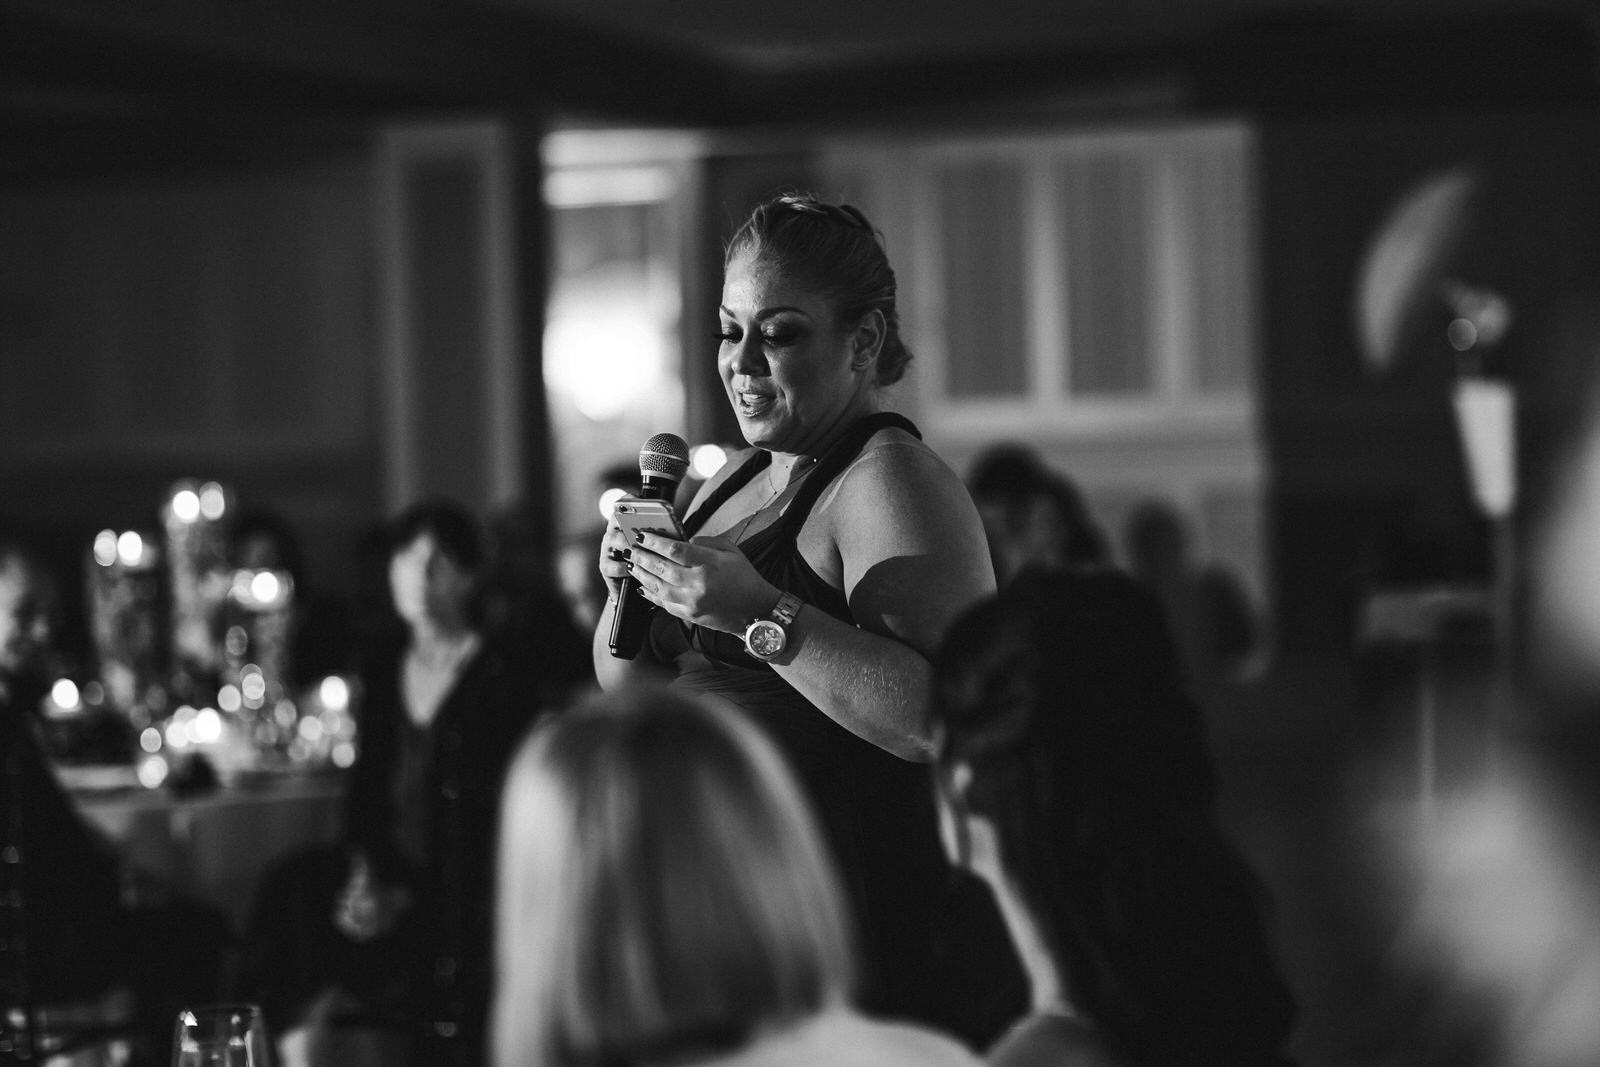 speeches_moments_tiny_house_photo_documentary_wedding_photography.jpg